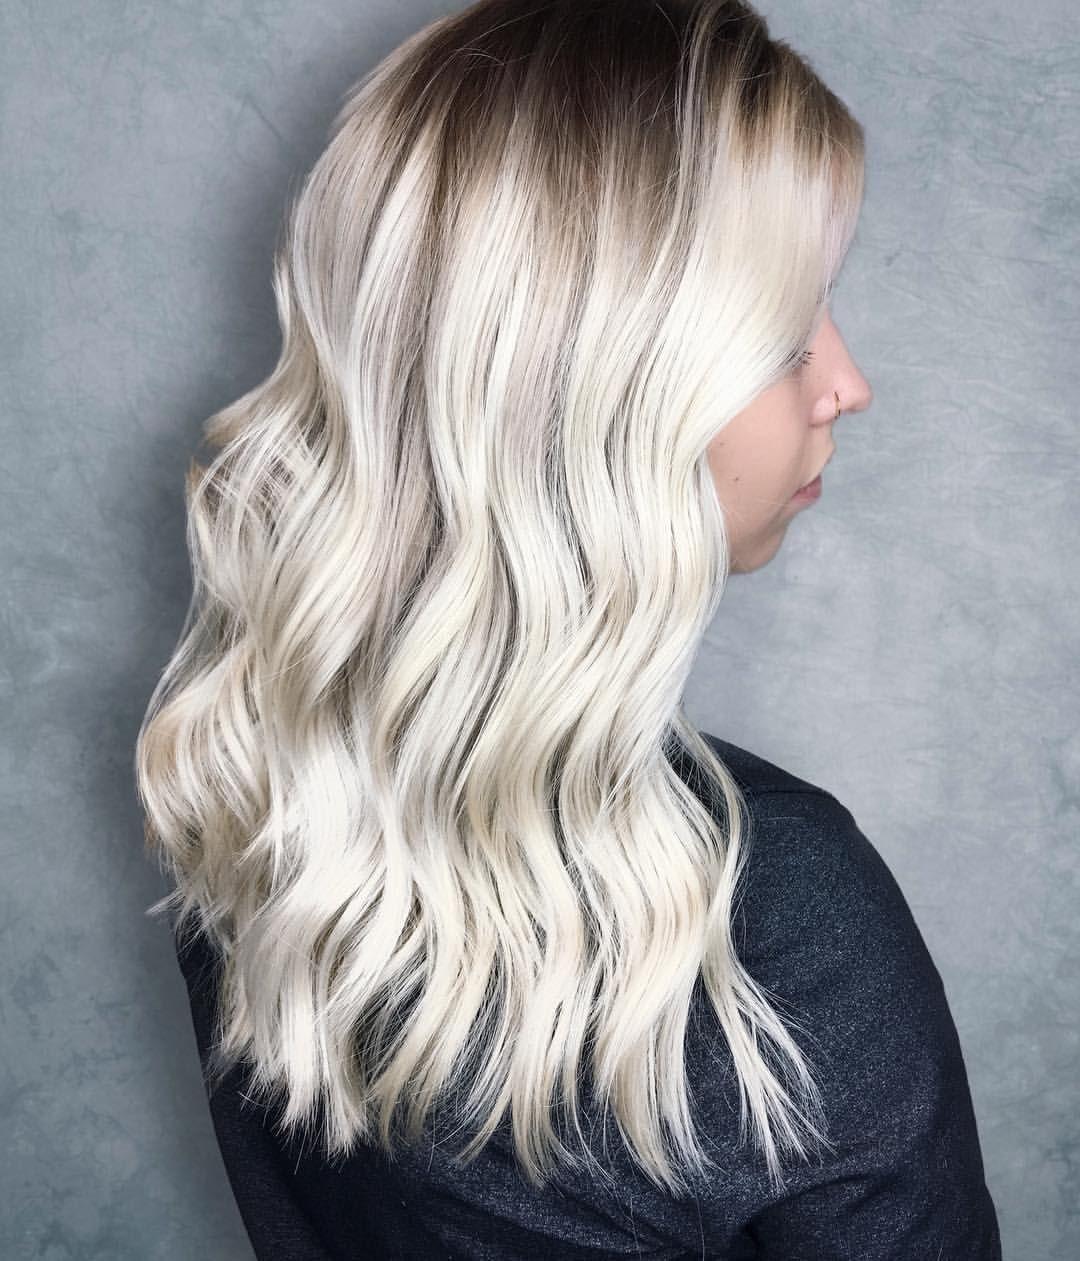 232 Likes, 4 Comments - Eric M | Hair | Toronto 🇨🇦 (@e_medz) on ...